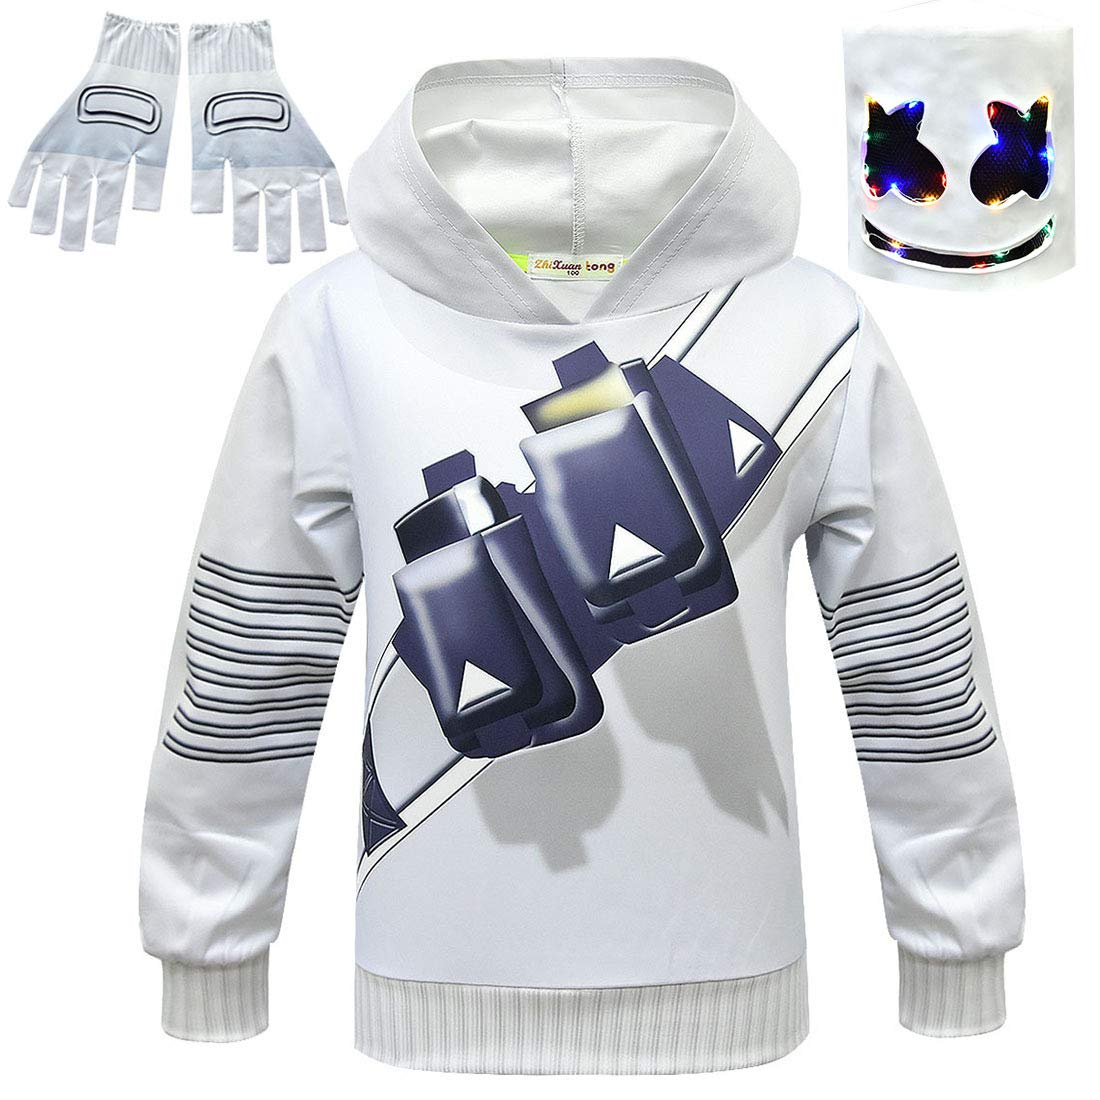 QYS DJ Marshmellow Costume Kids Fancy Party Dress Máscara suéter ...